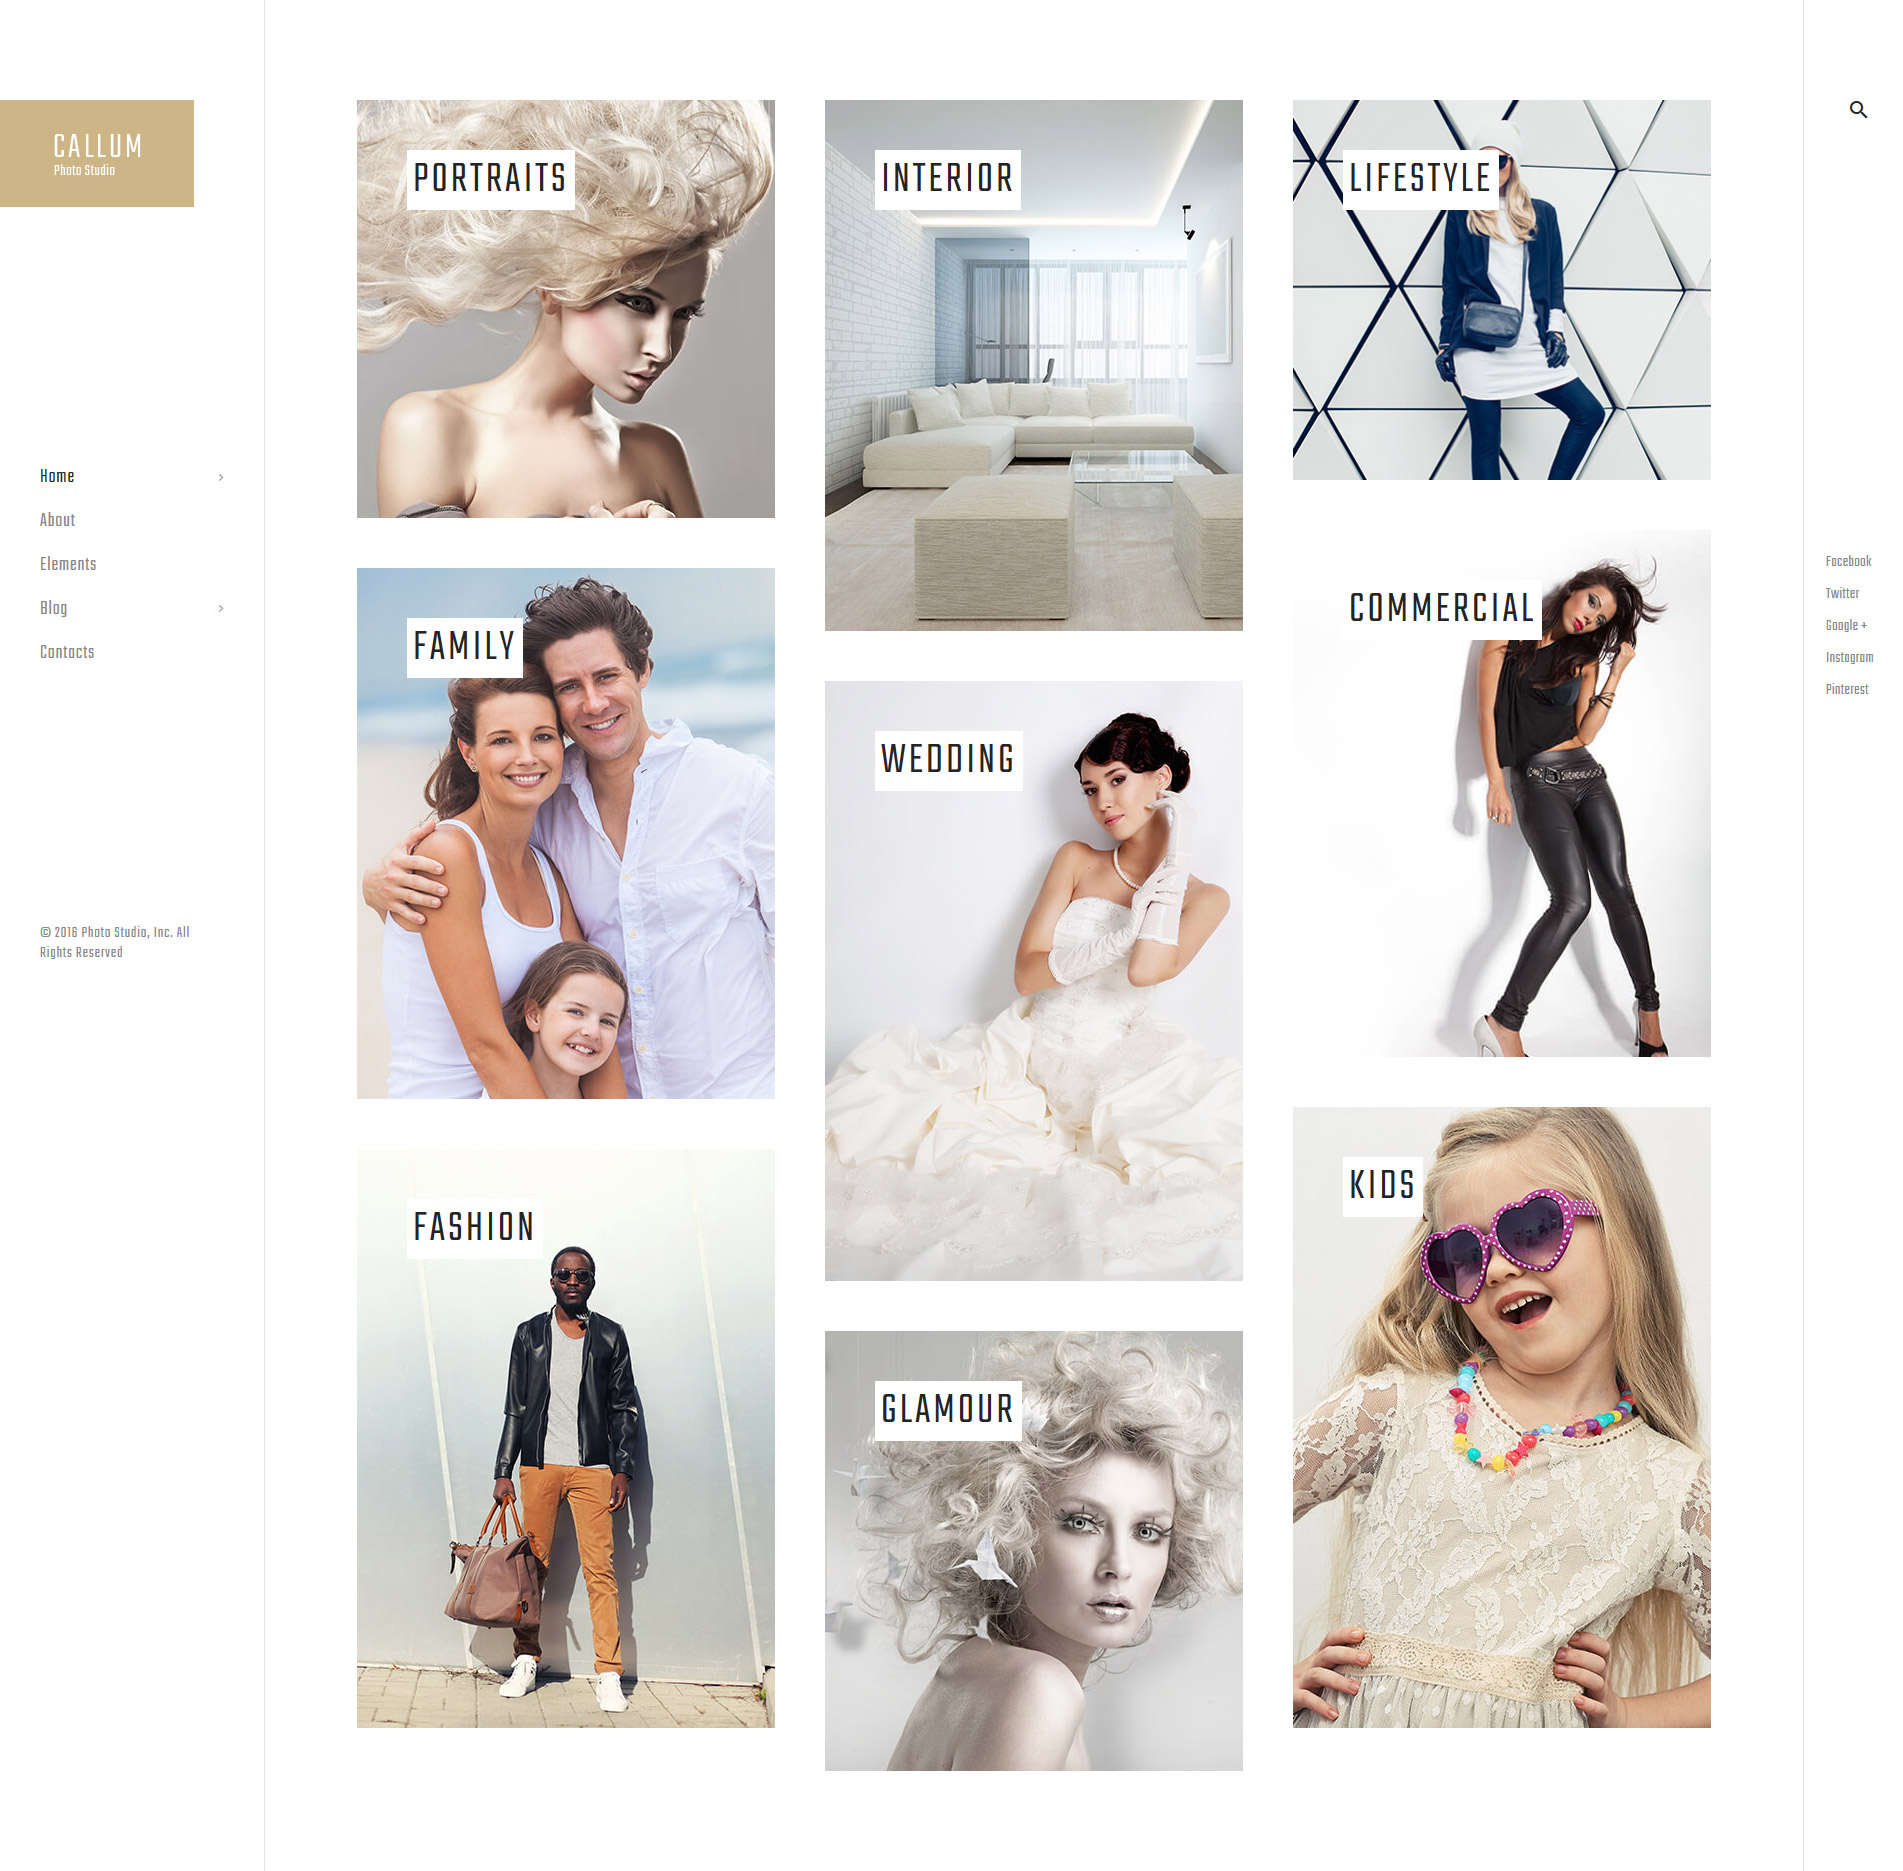 Responsivt Callum - wedding photo gallery WordPress-tema #61164 - skärmbild